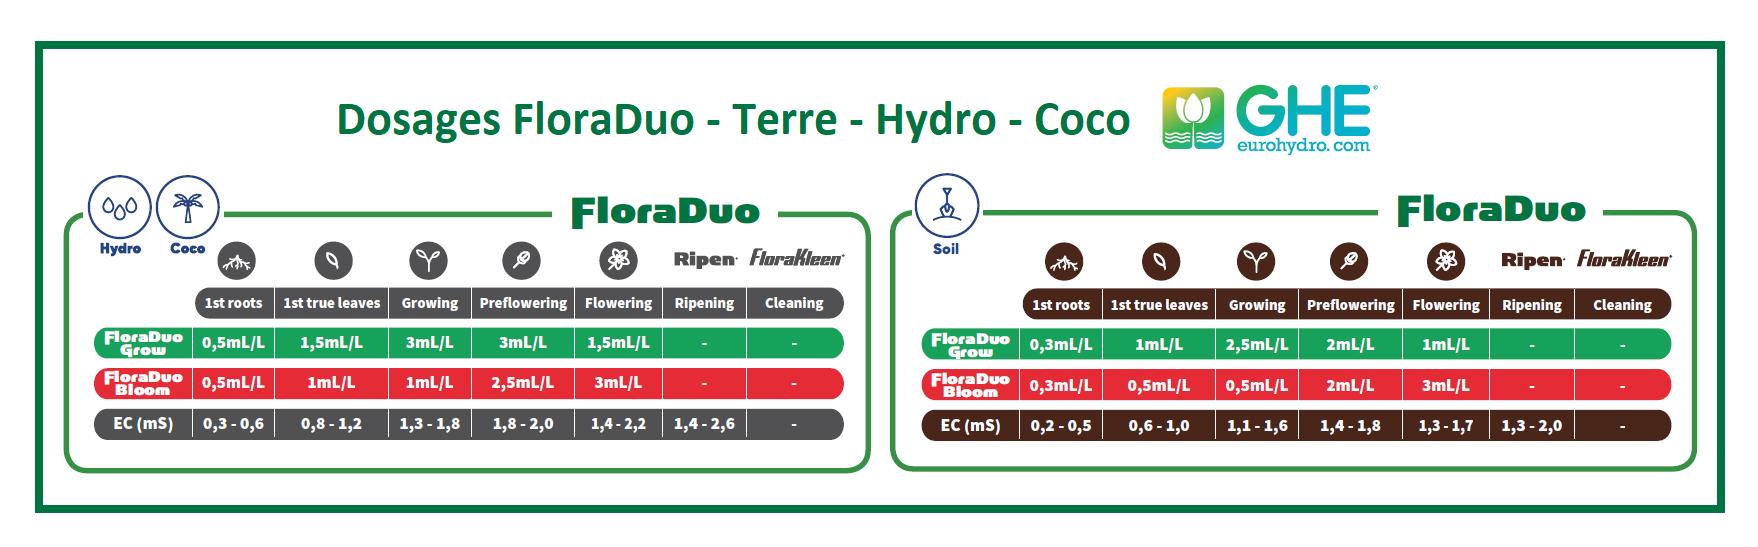 Dosages engrais FloraDuo